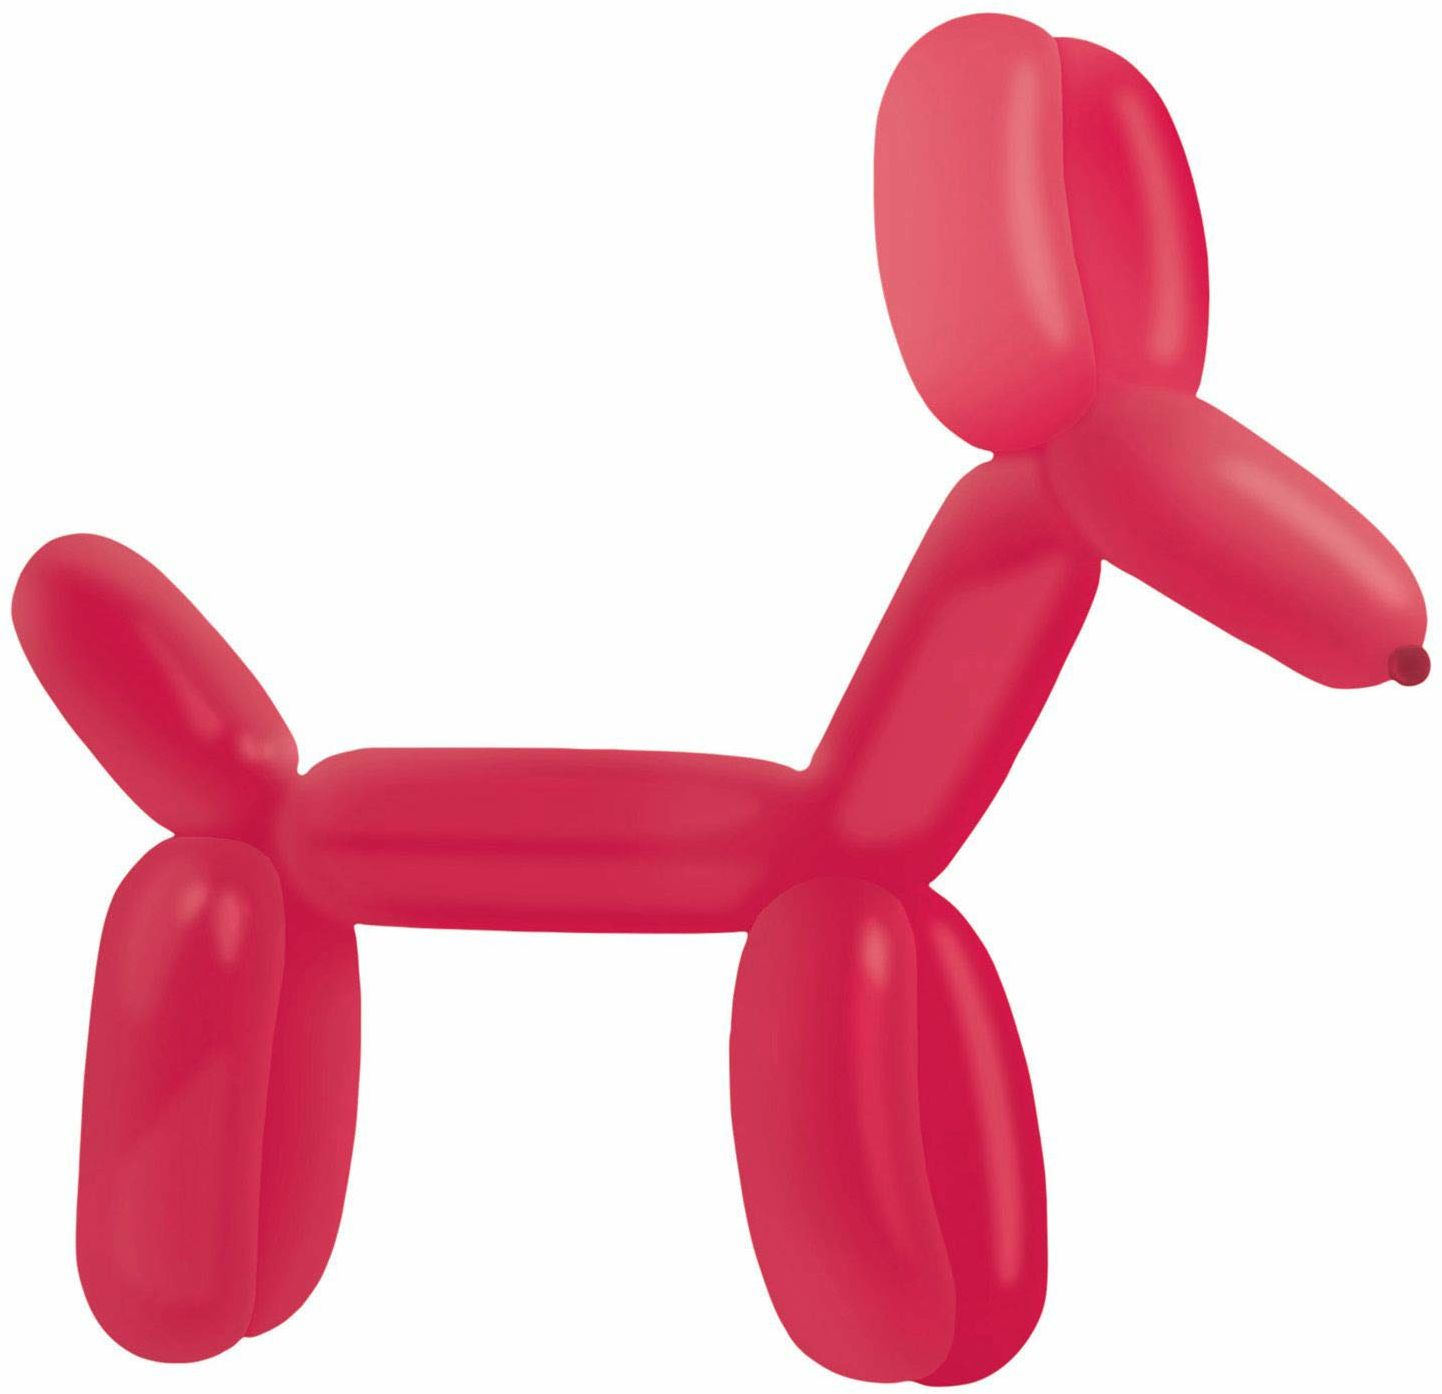 amscan 9905540 100 lateksowe balony do modelowania Fashion E260, czerwony jagodowy